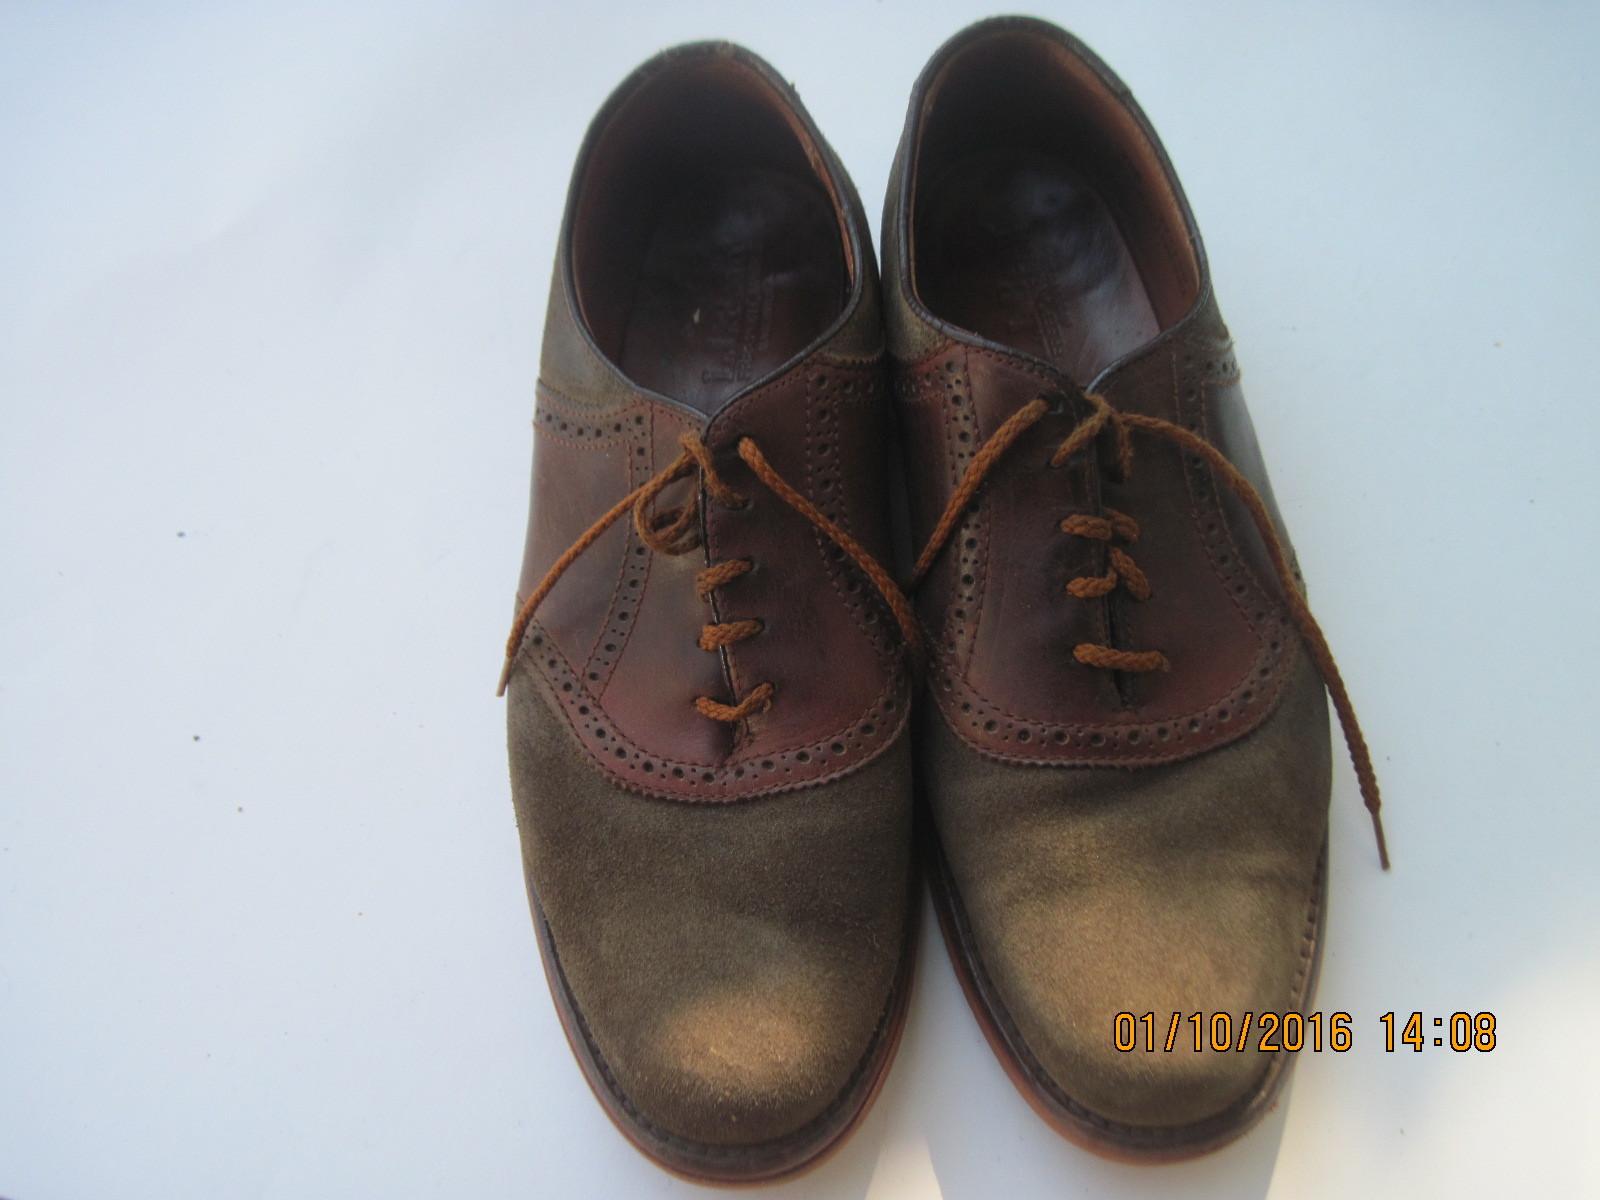 Vintage L.L.BEAN Green Suede Men's Saddle Leather Oxford